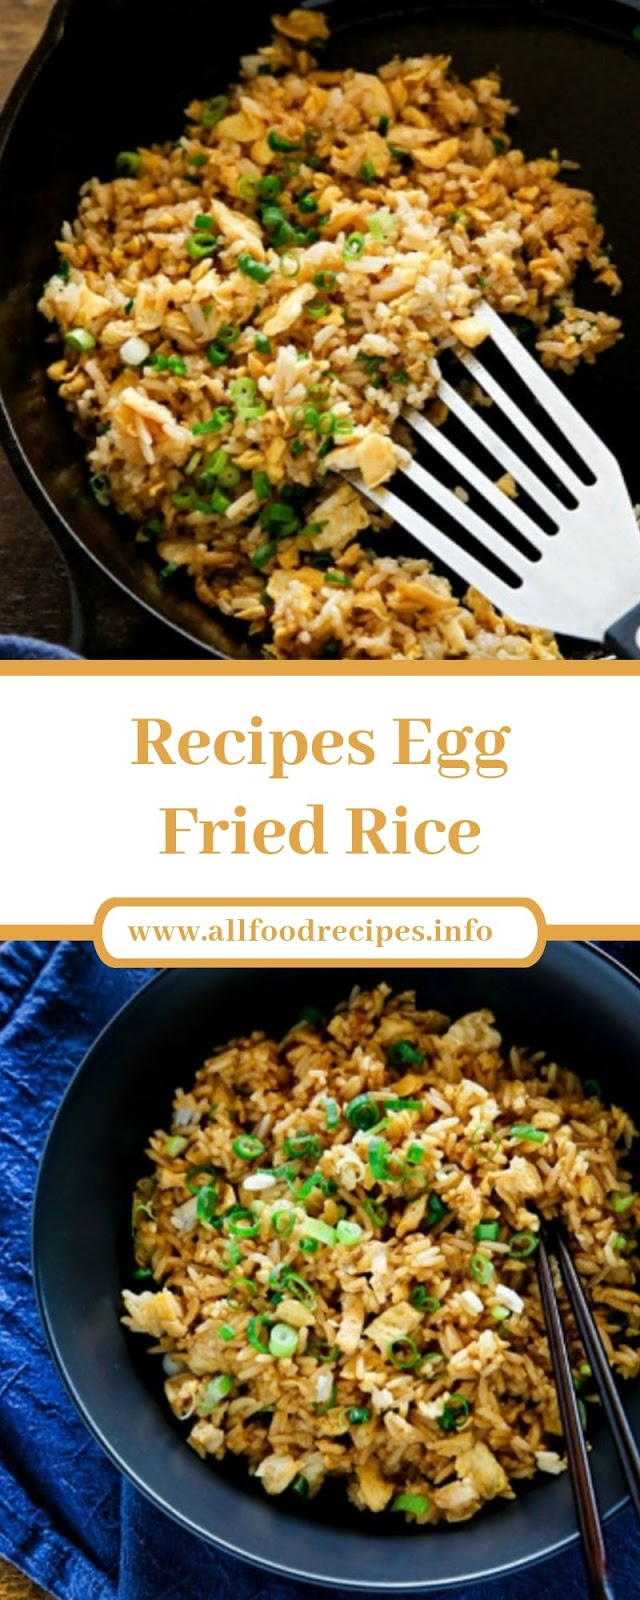 Recipes Egg Fried Rice